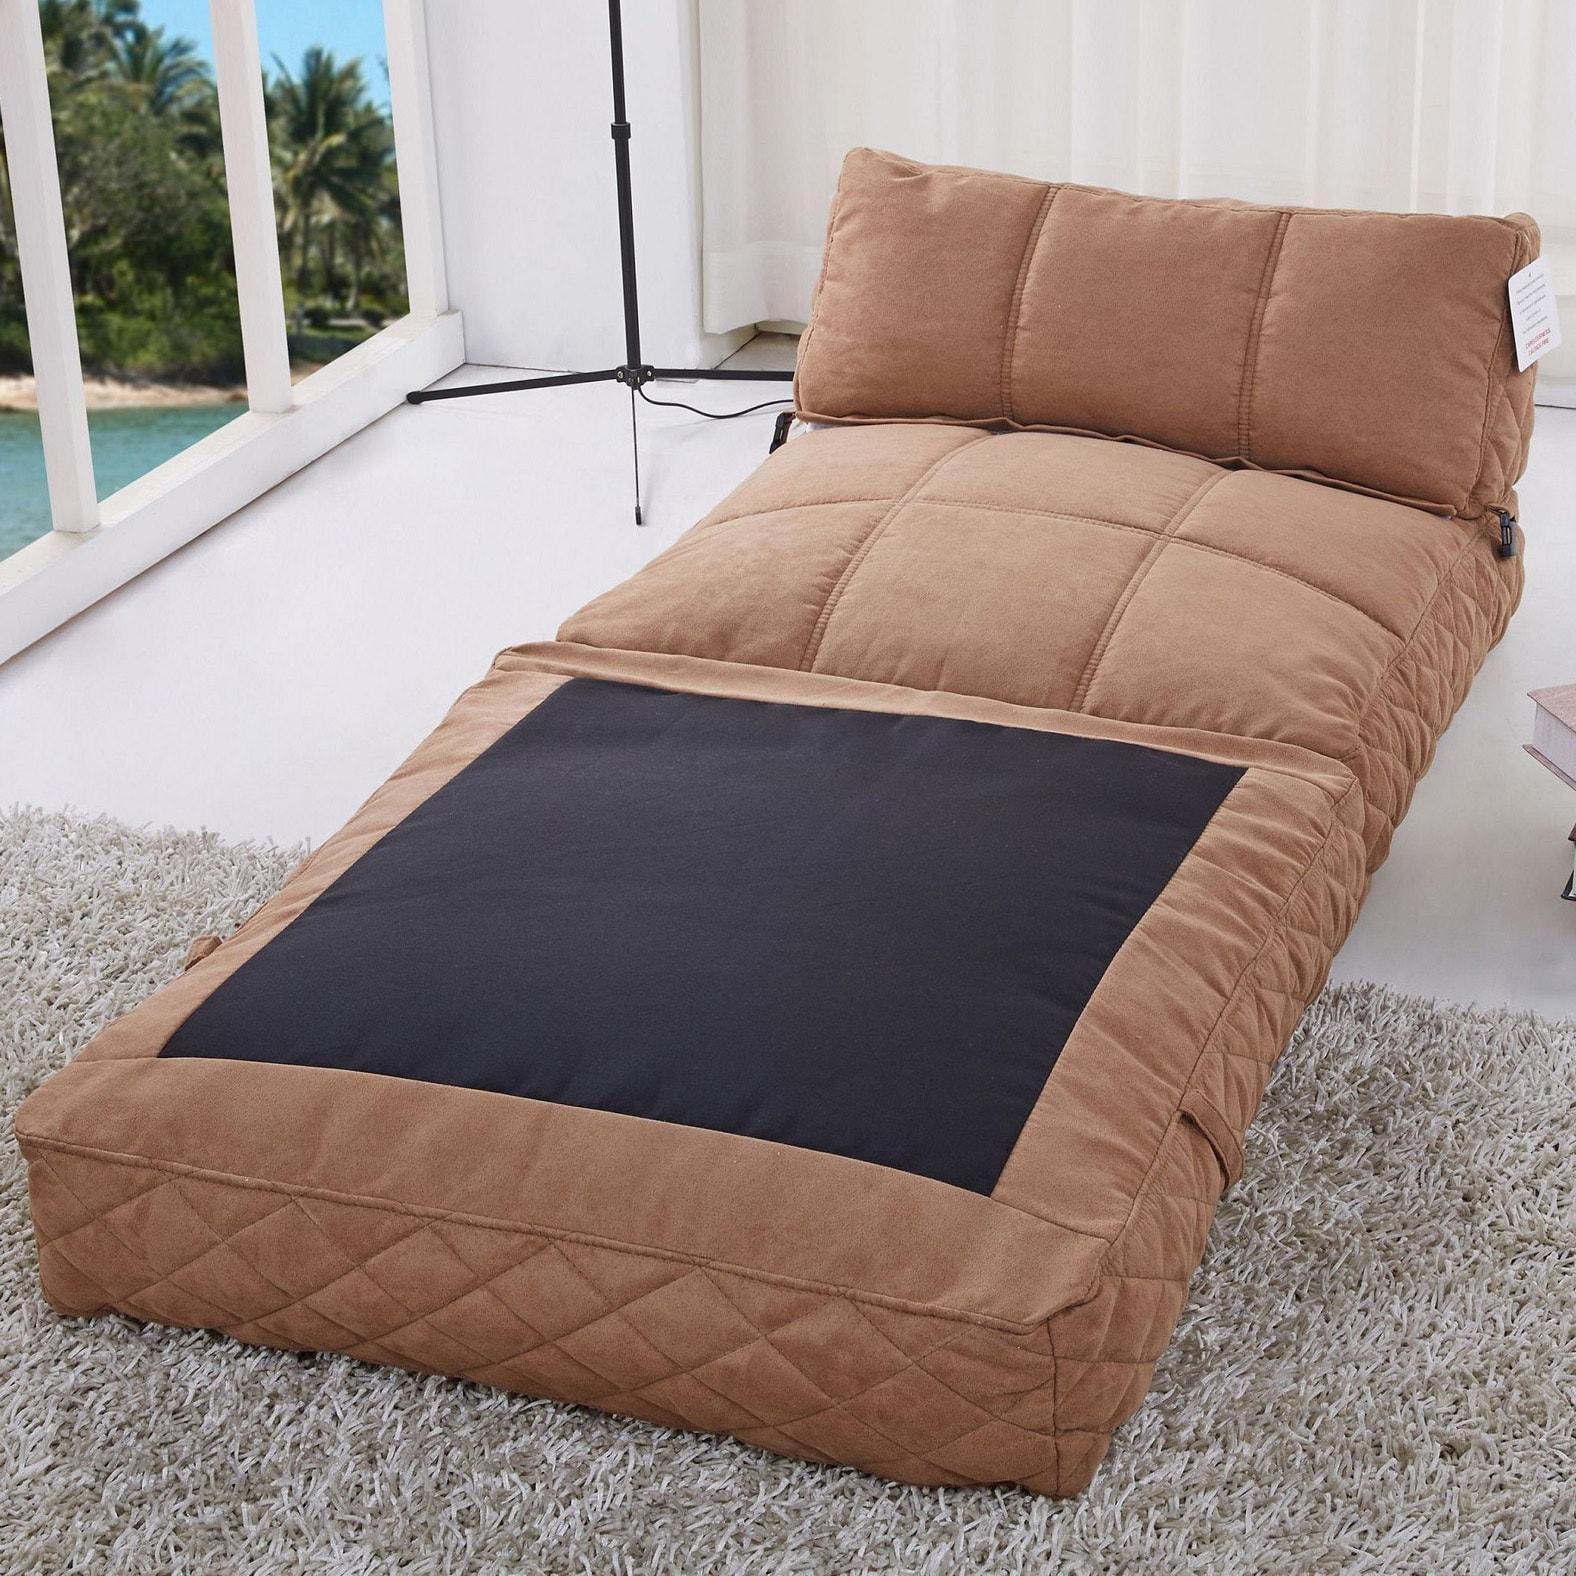 Merveilleux Shop Austin Cobblestone Bean Bag Chair Bed   Free Shipping Today    Overstock.com   9290697